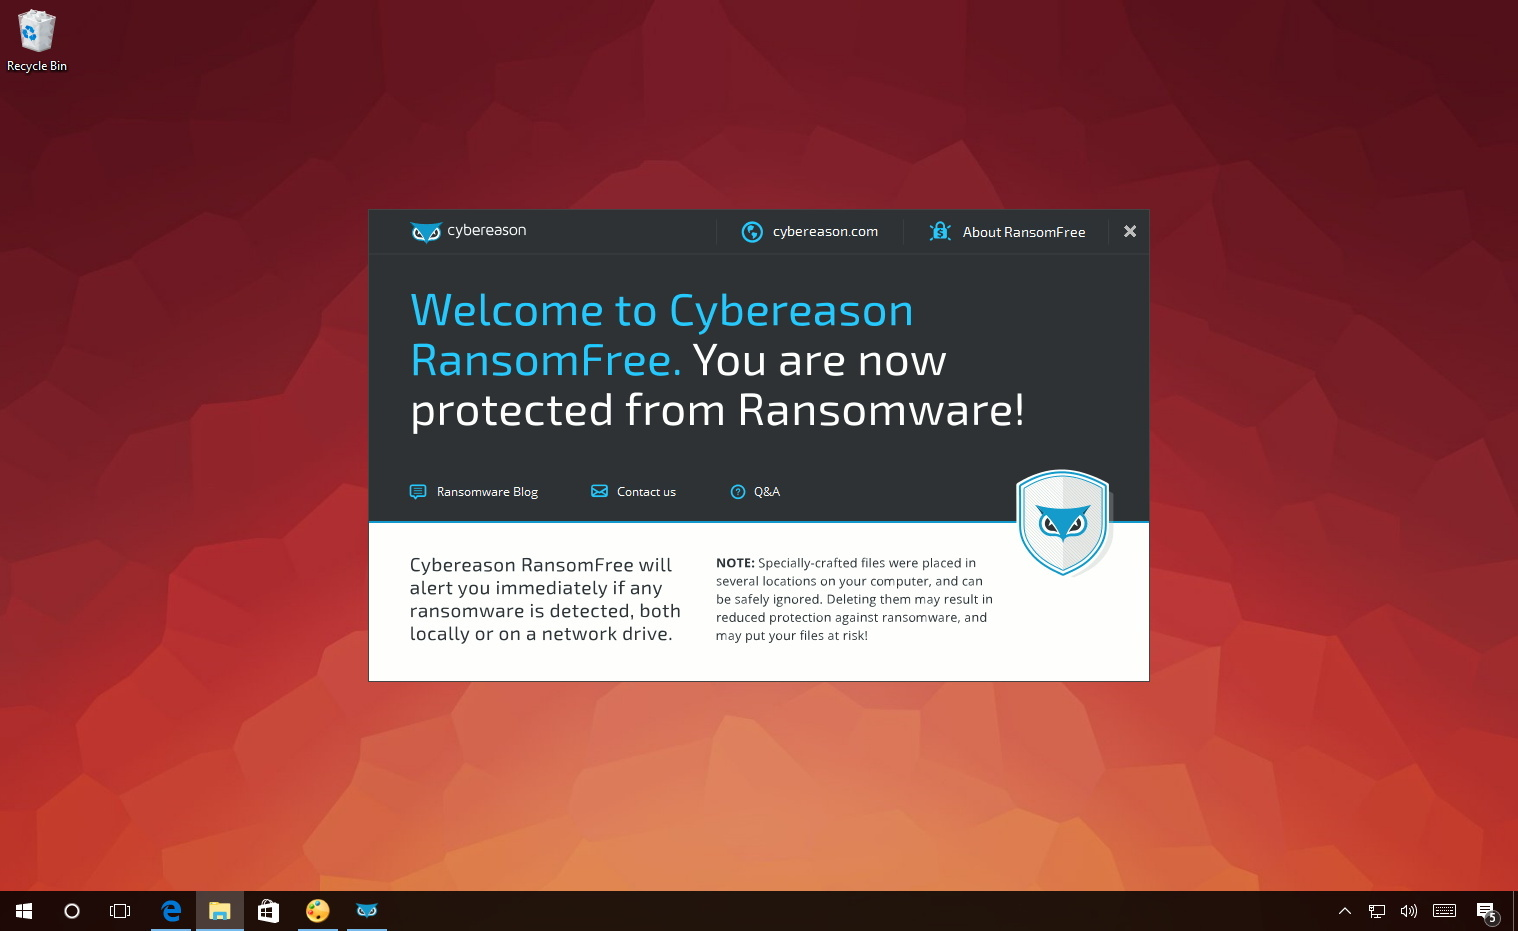 Cybereason RansomFree anti-ransomware software